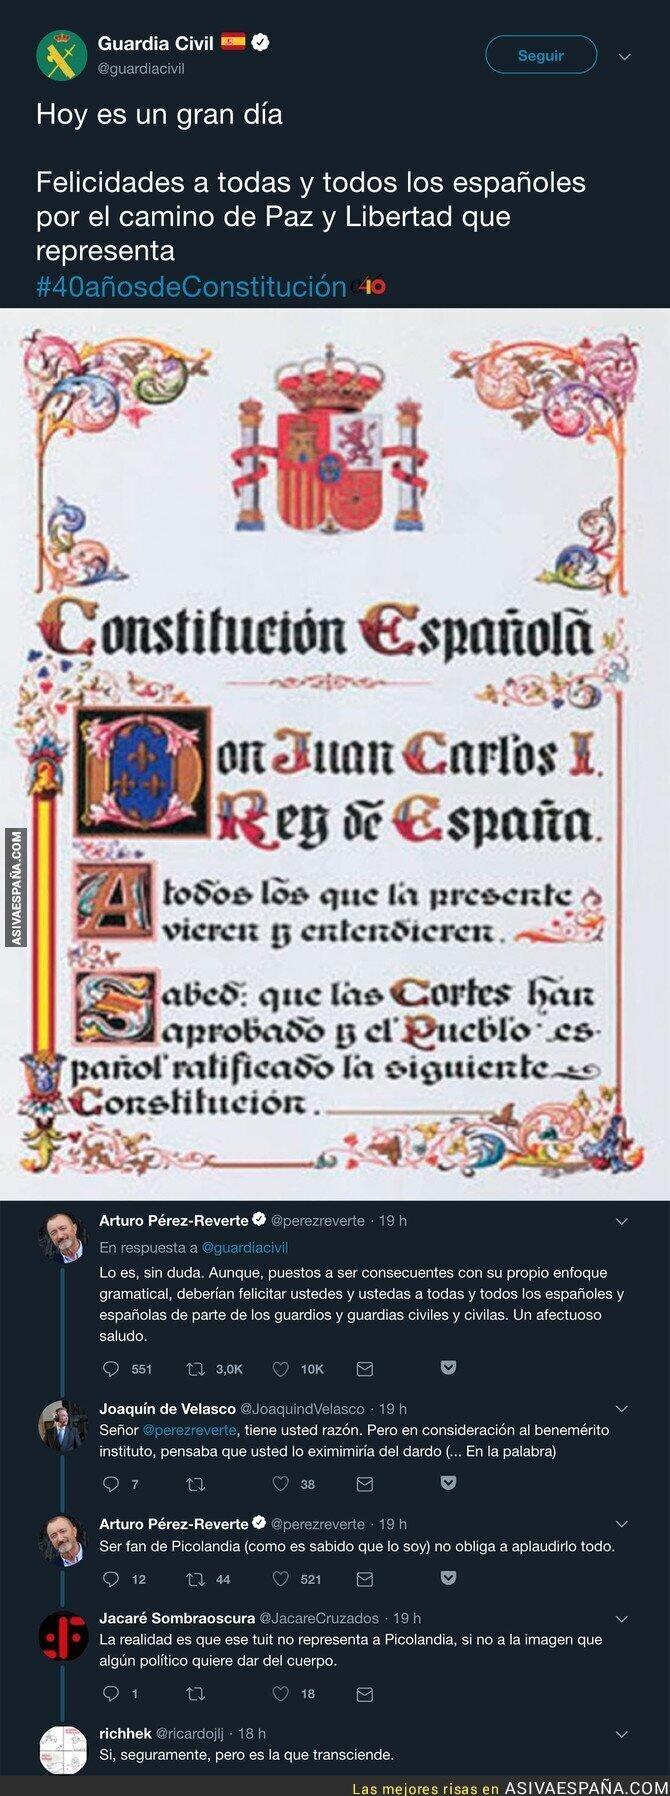 99792 - Arturo Pérez-Reverte le pega un gran hachazo a la Guardia Civil tras felicitar a los españoles con lenguaje inclusivo